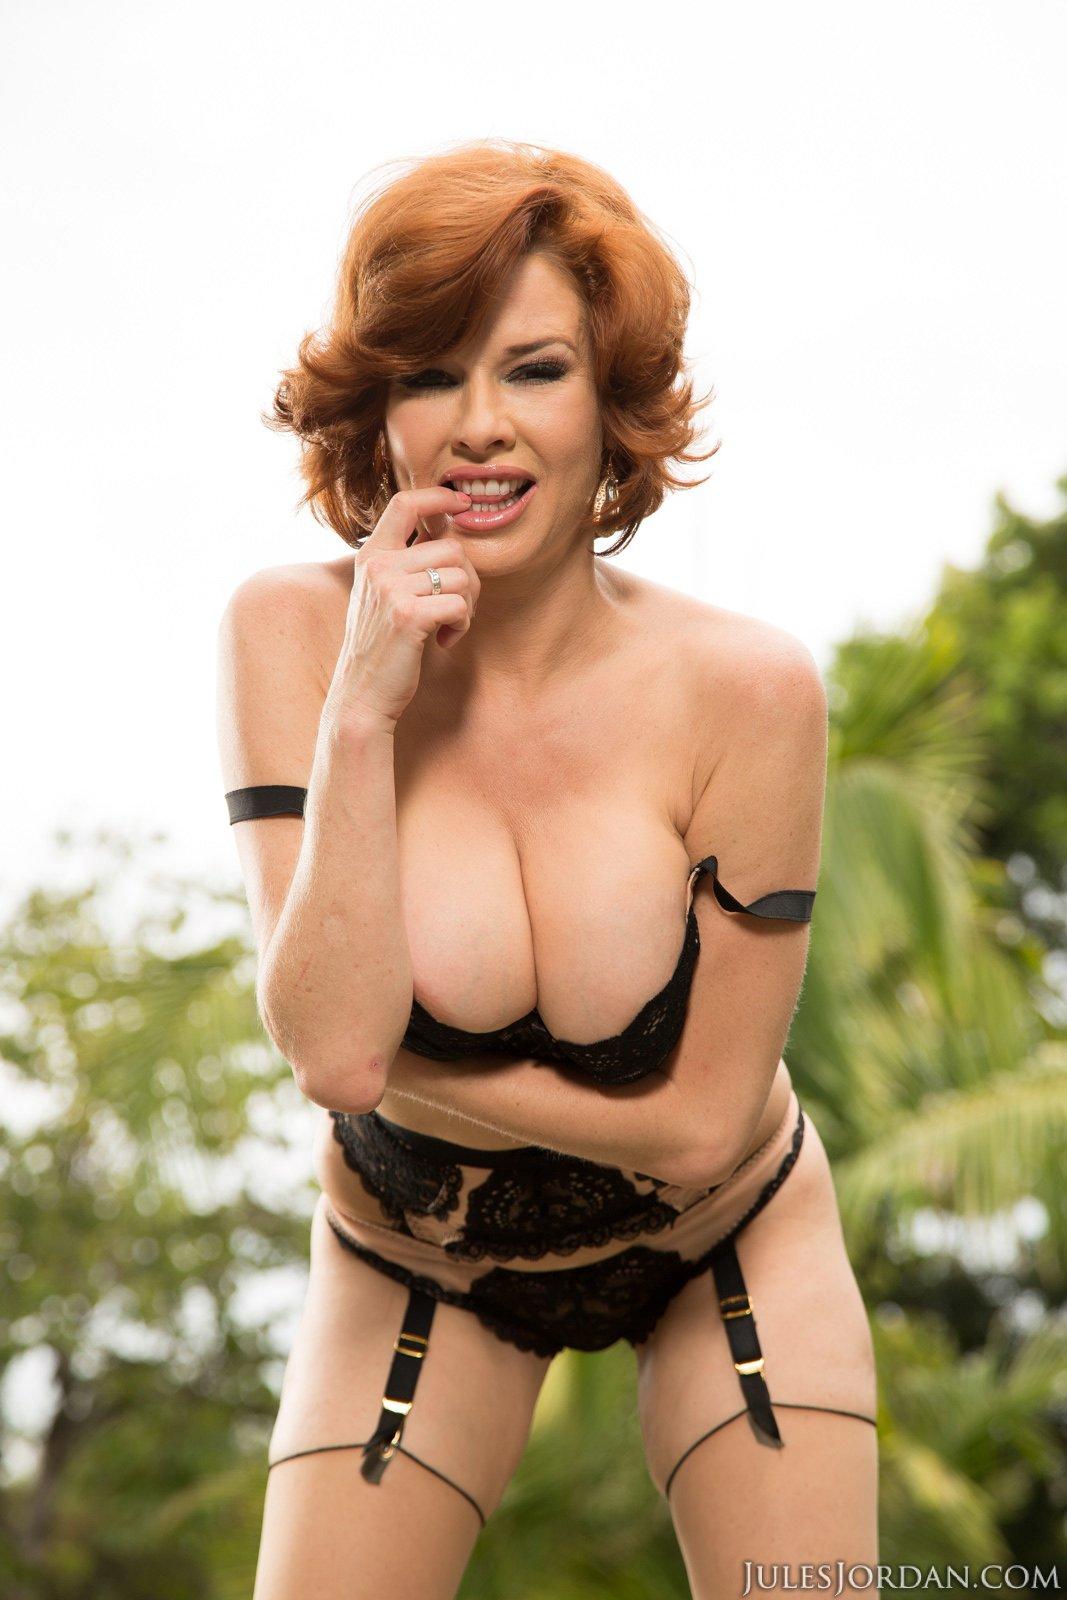 nude Veronica outdoors posing